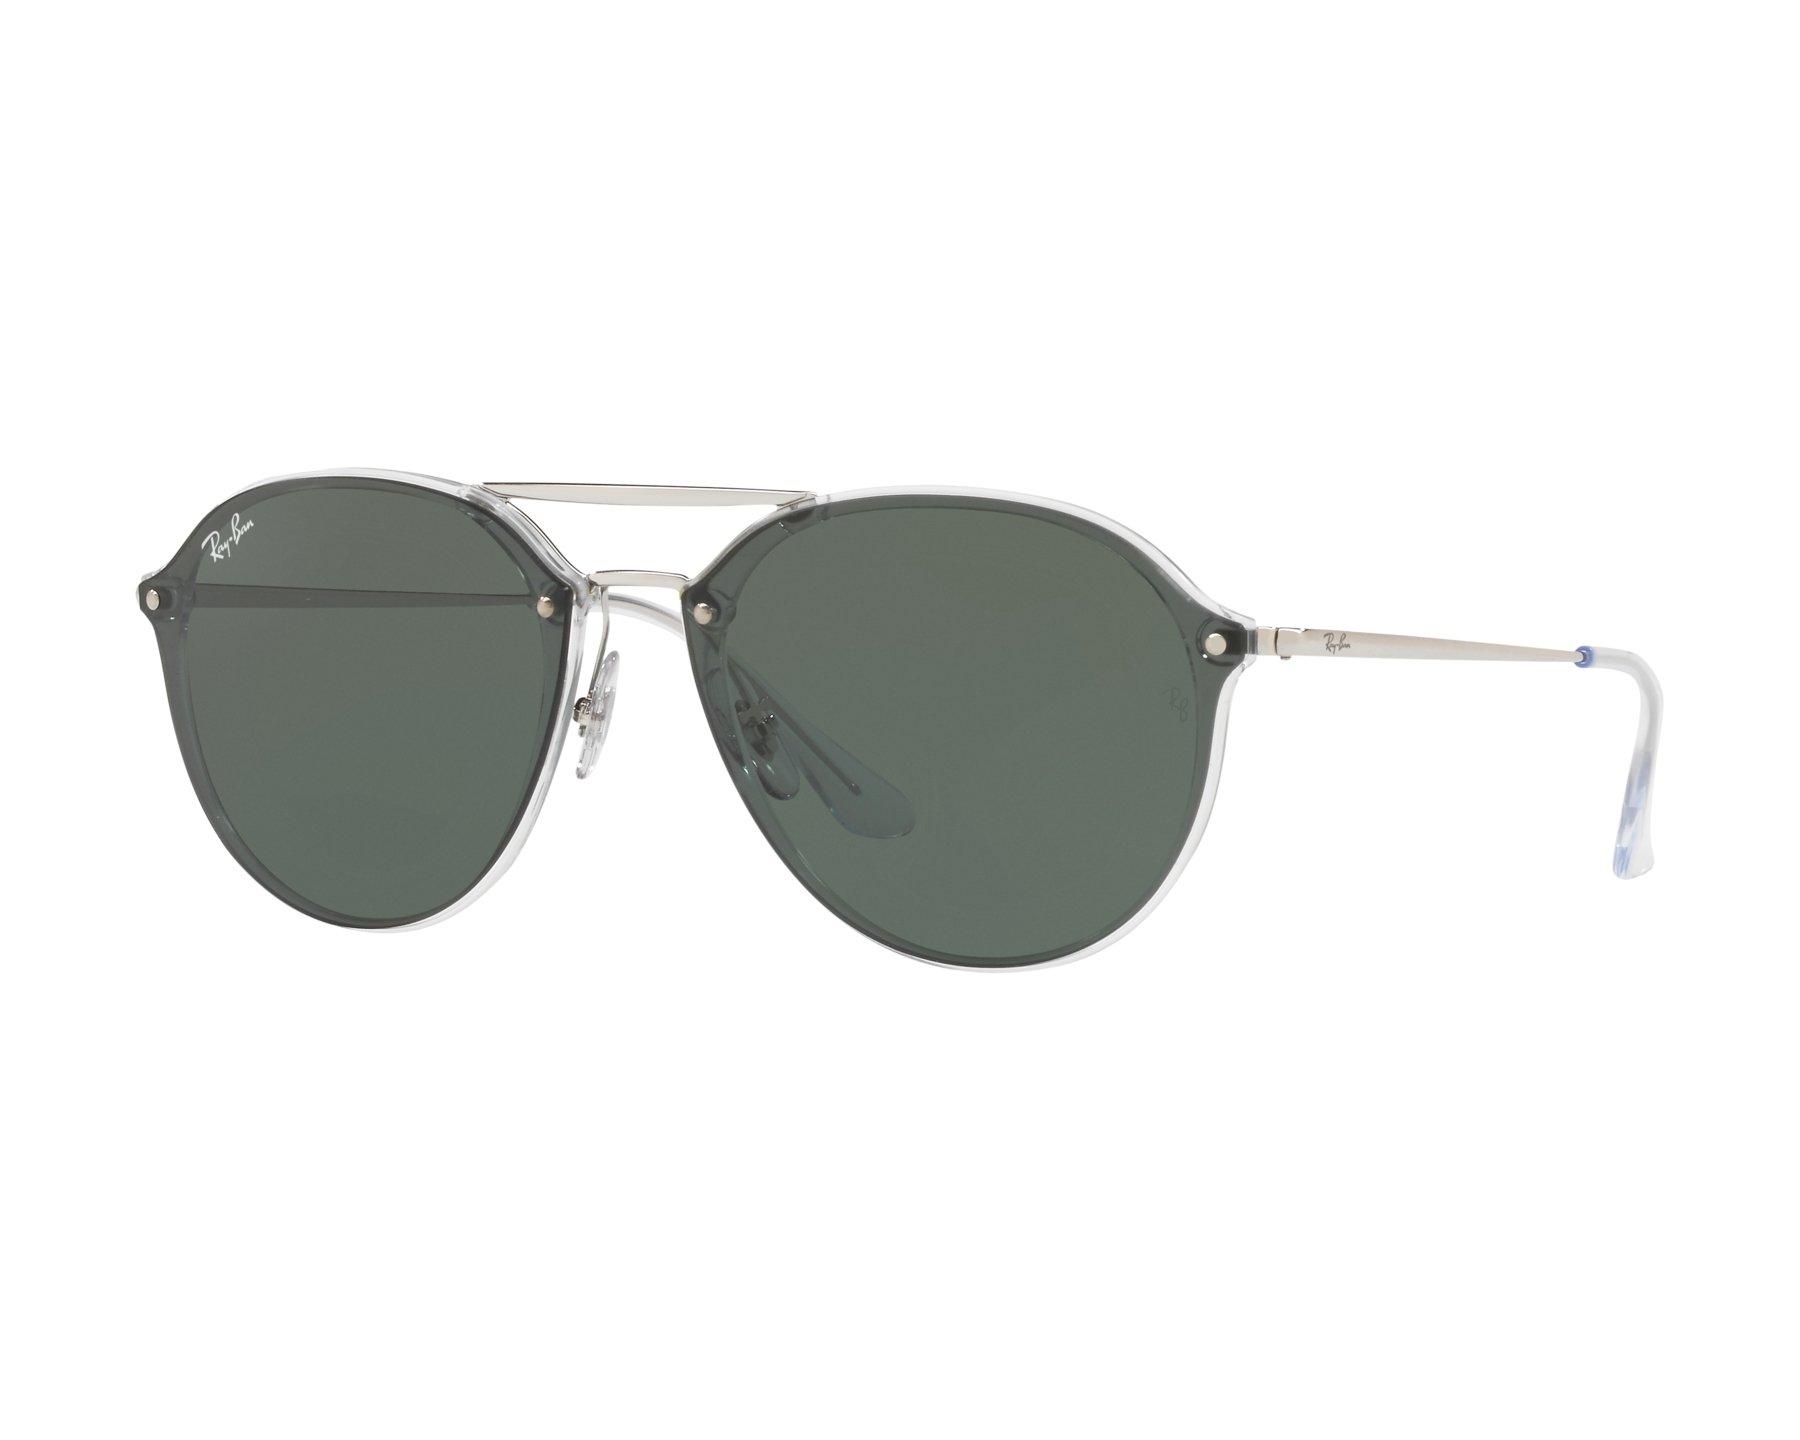 f3f0e85d8e5cae Sunglasses Ray-Ban RB-4292-N 632571 62-14 Silver Crystal